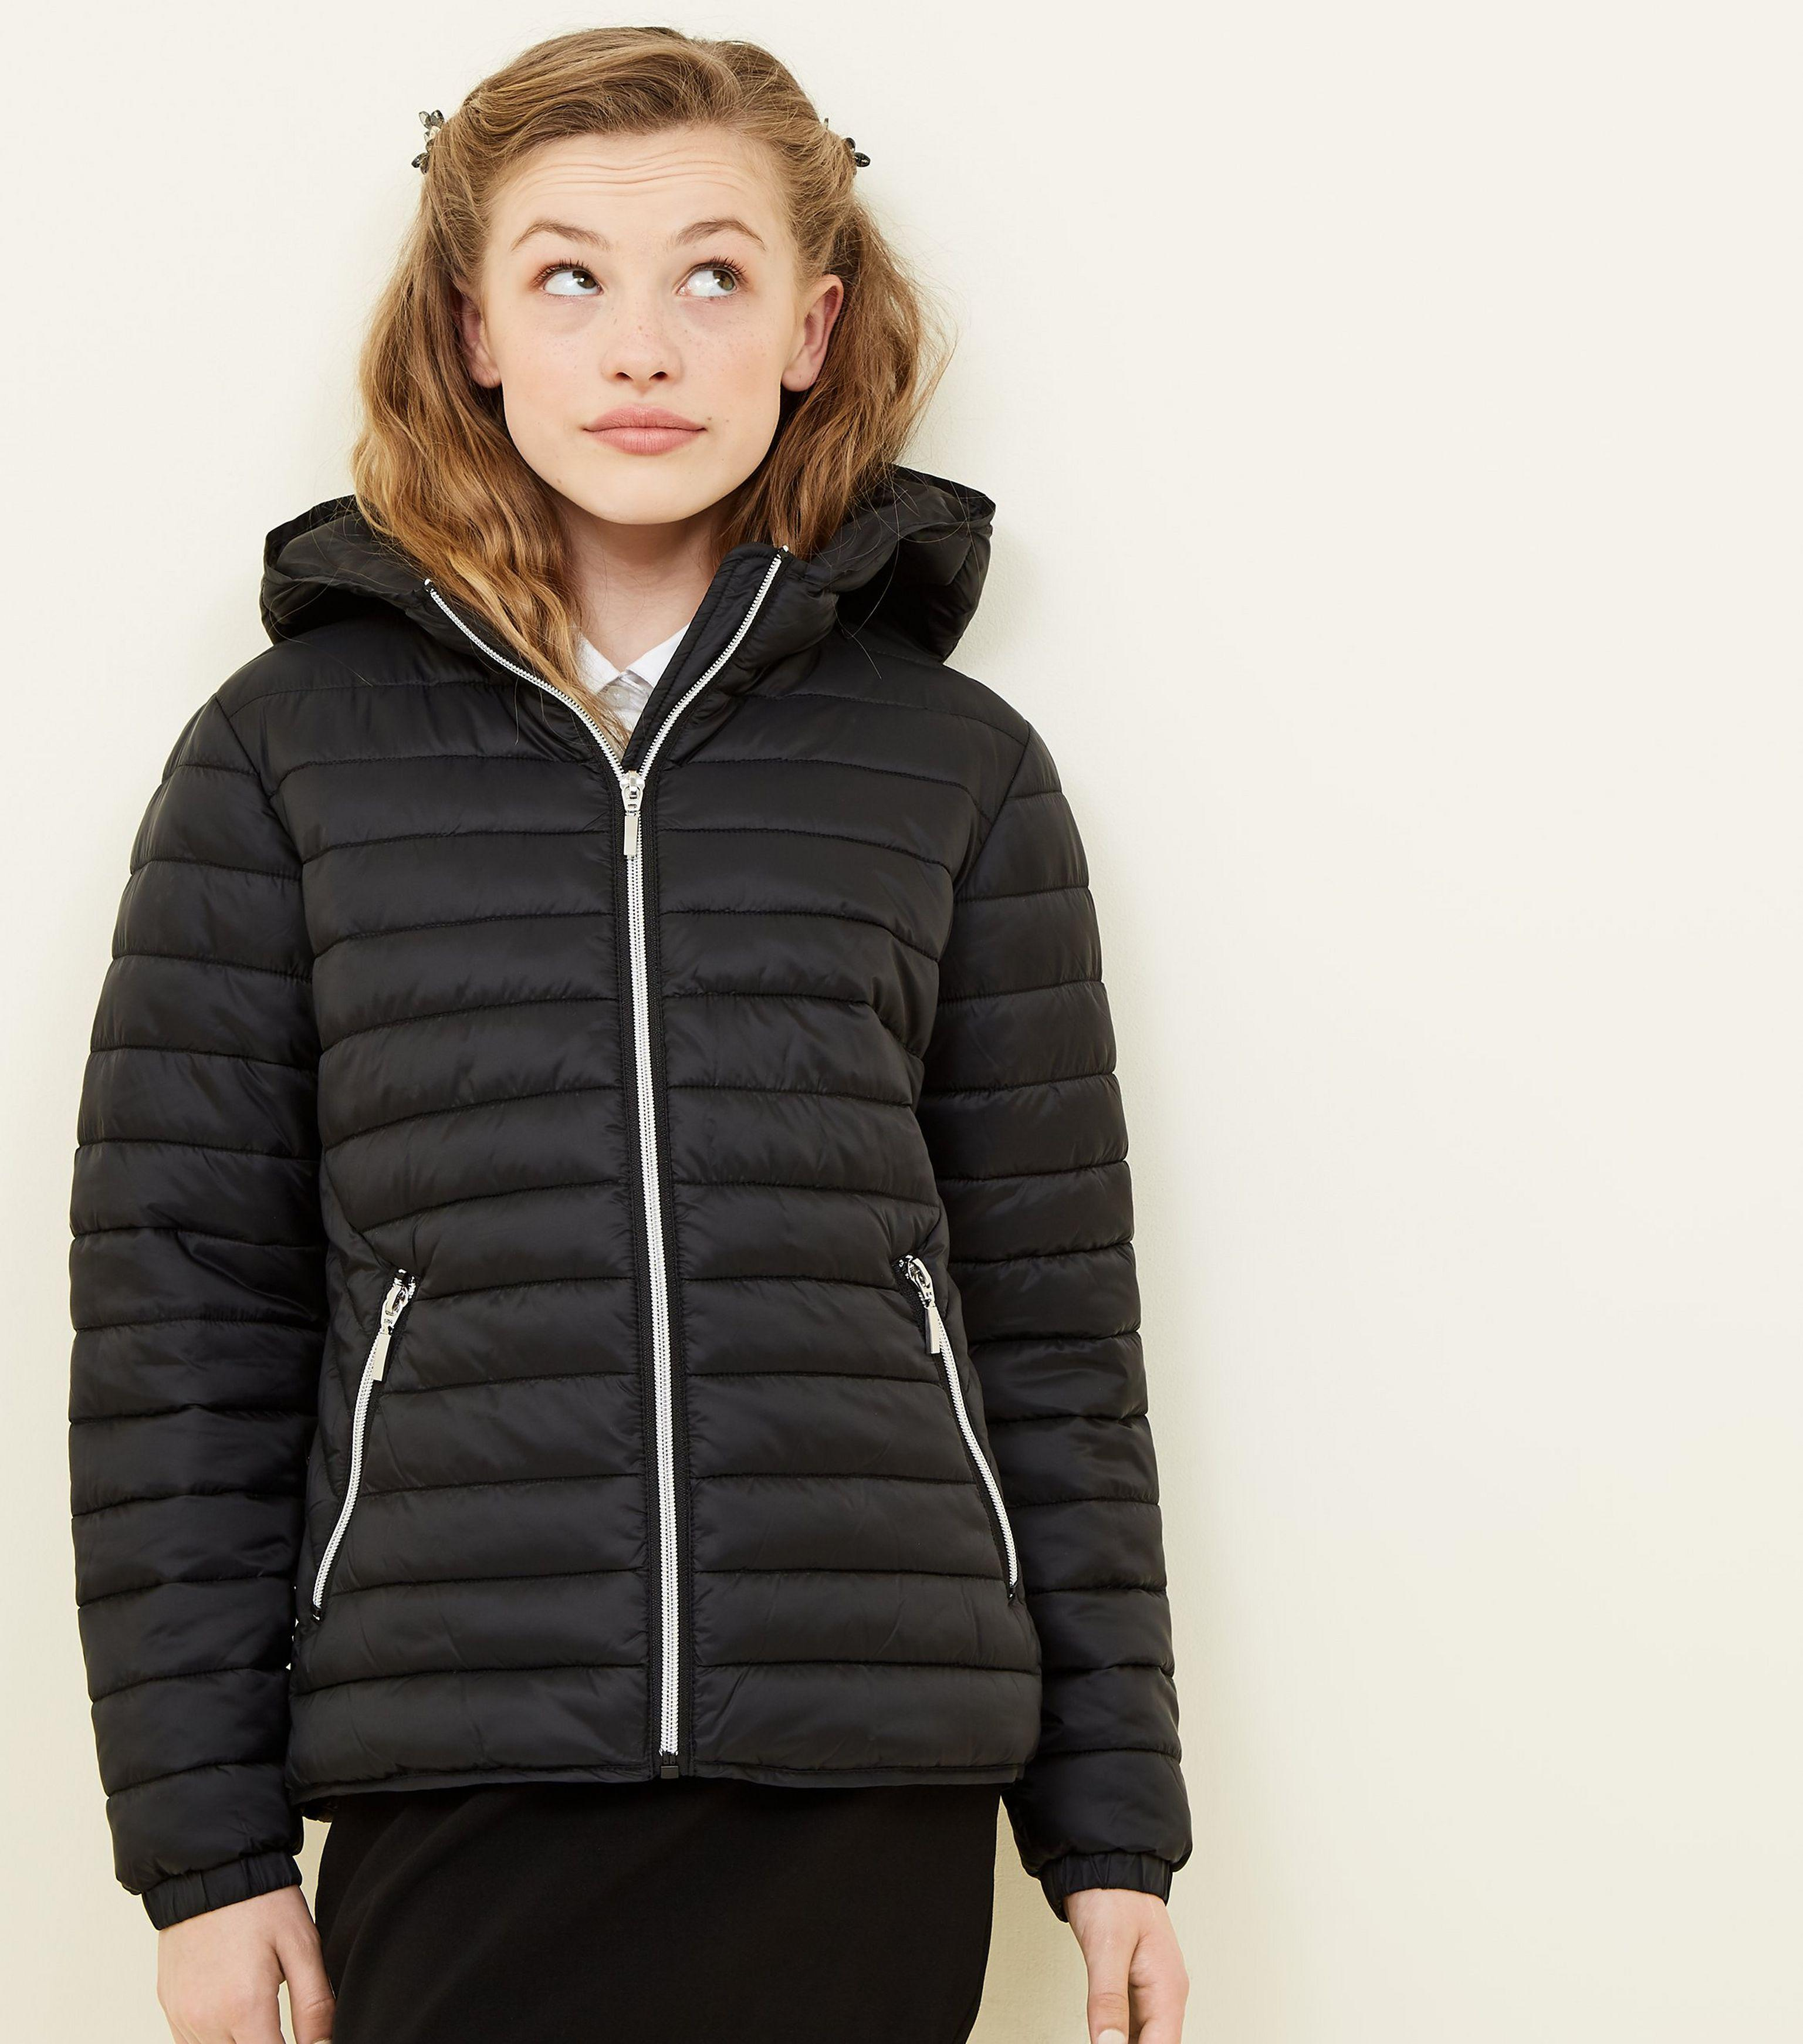 3ba75e0a3 New Look Girls Black Lightweight Hooded Puffer Jacket in Black - Lyst